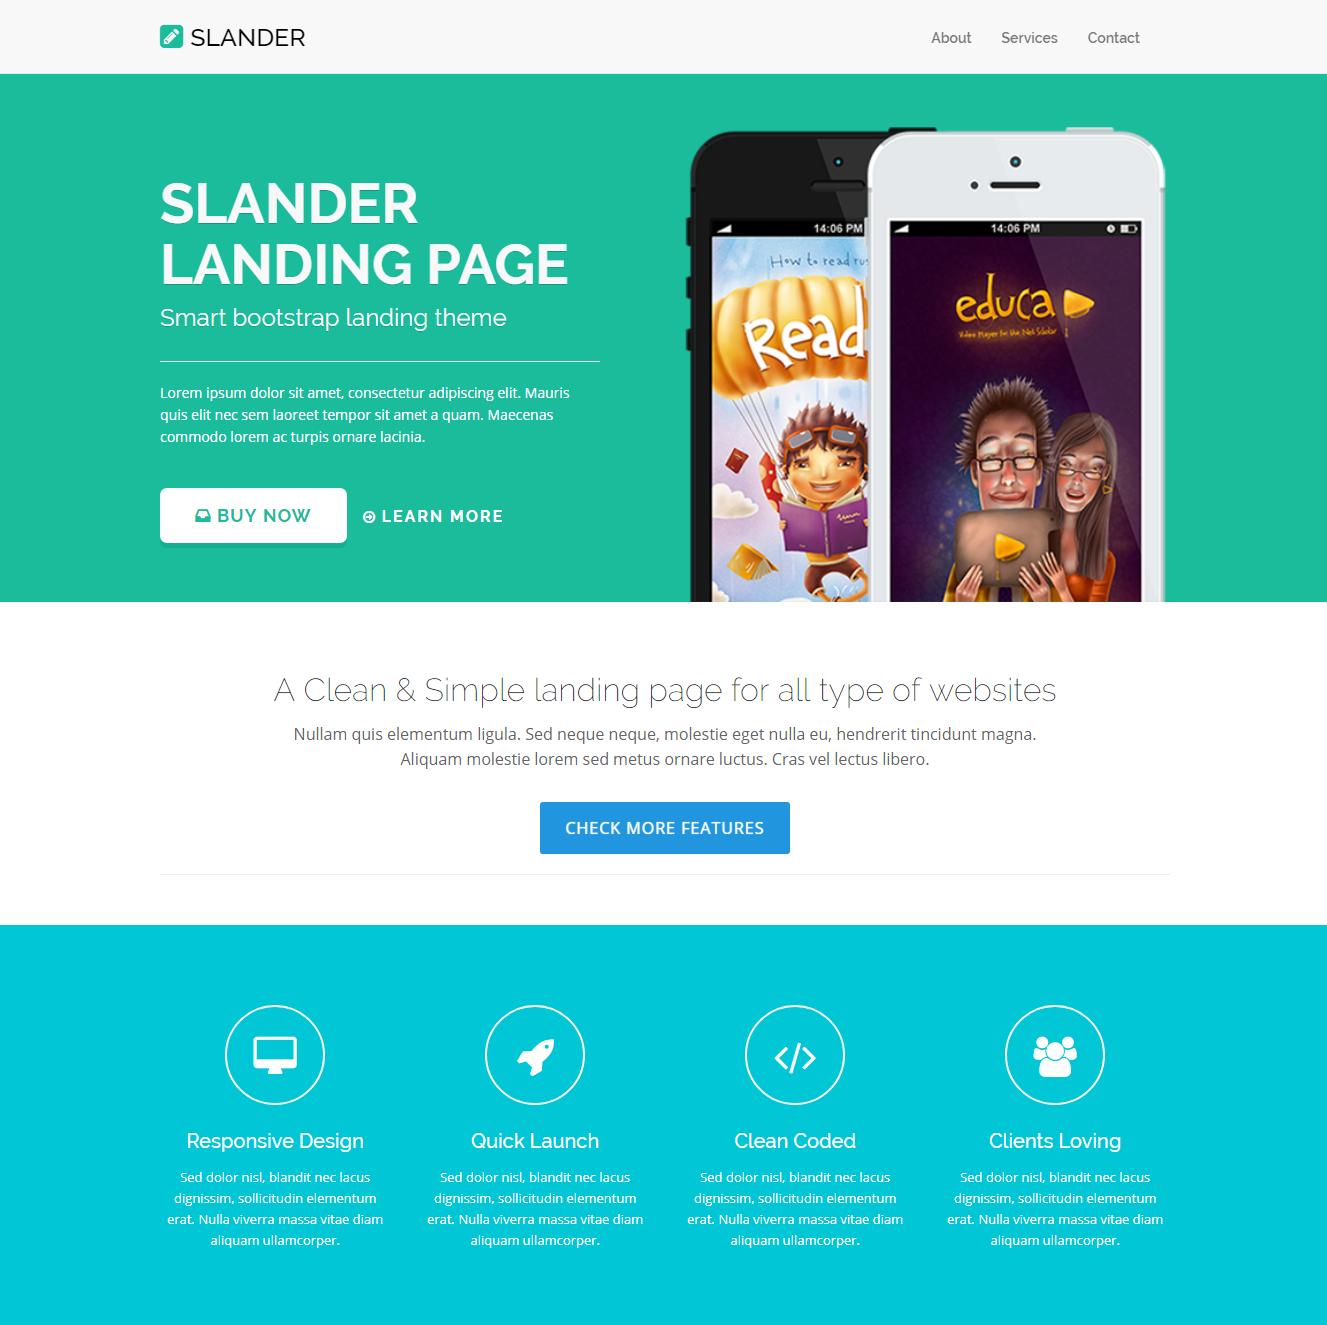 HTML5 Bootstrap Slander Templates